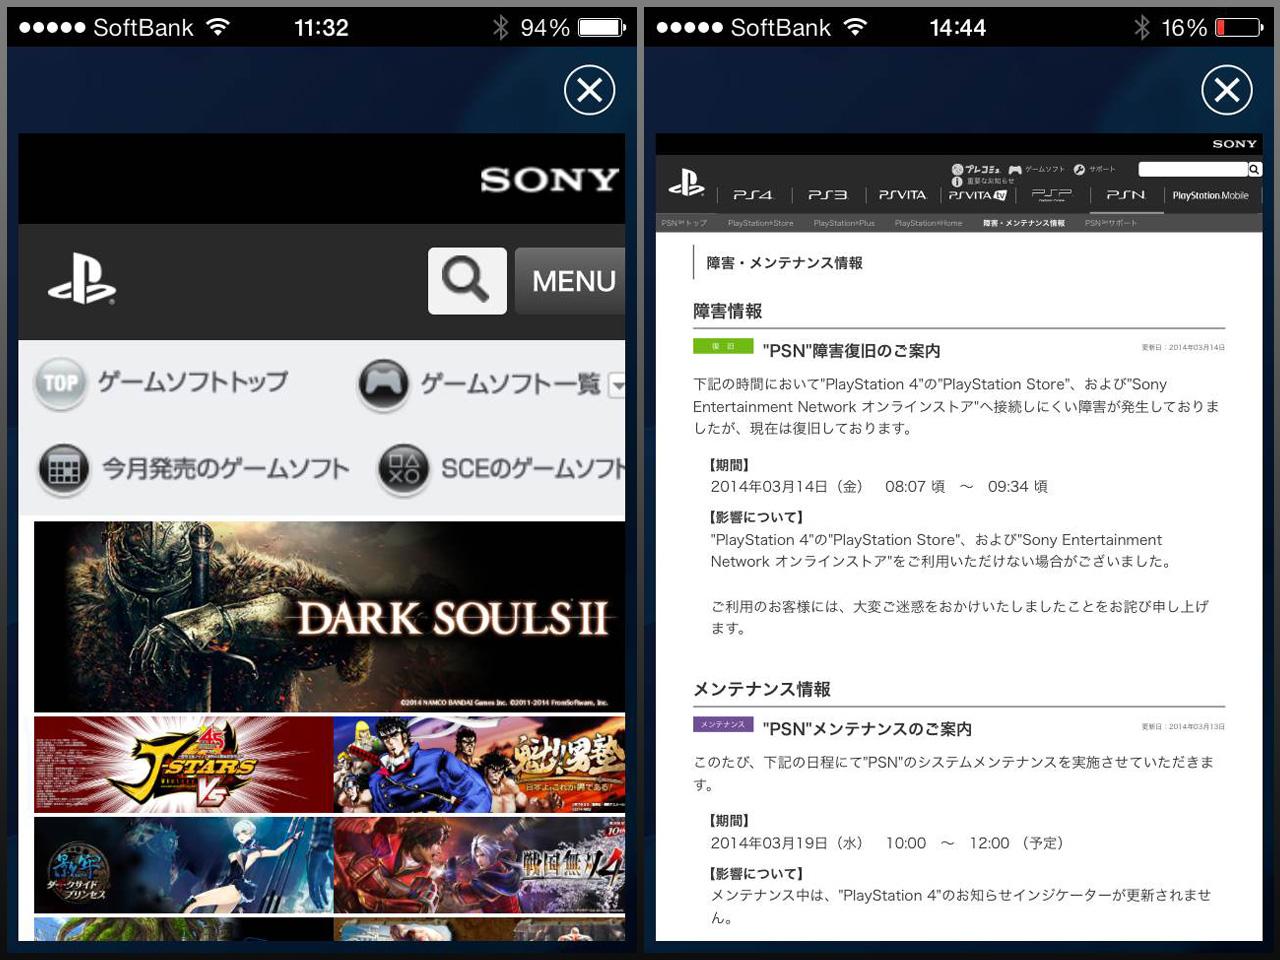 PS4 PlayStationAppの使い方♪(トピックス編)